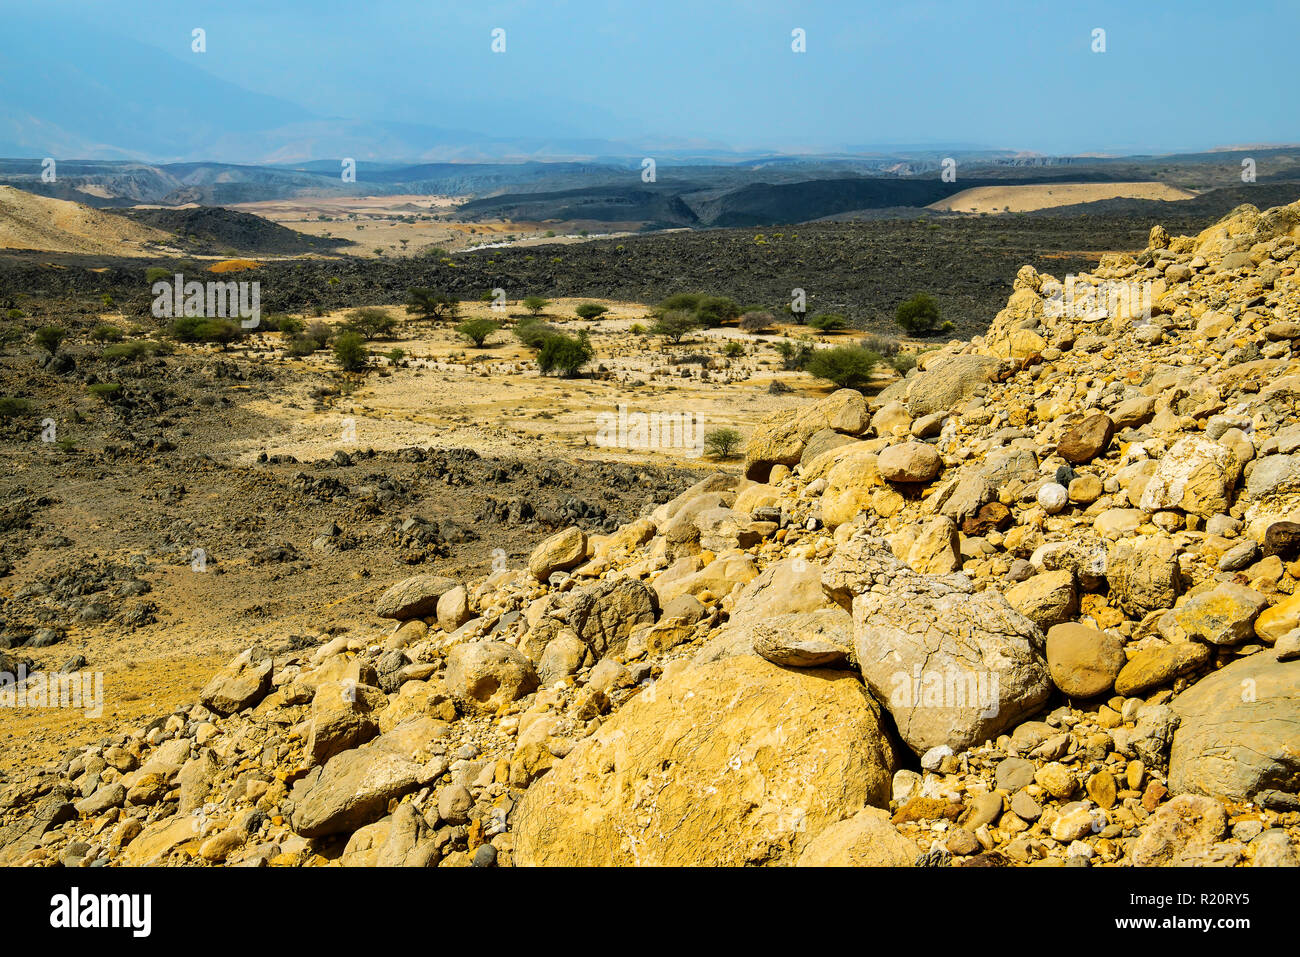 Lunar landscape around village Al Ya, Oman. - Stock Image